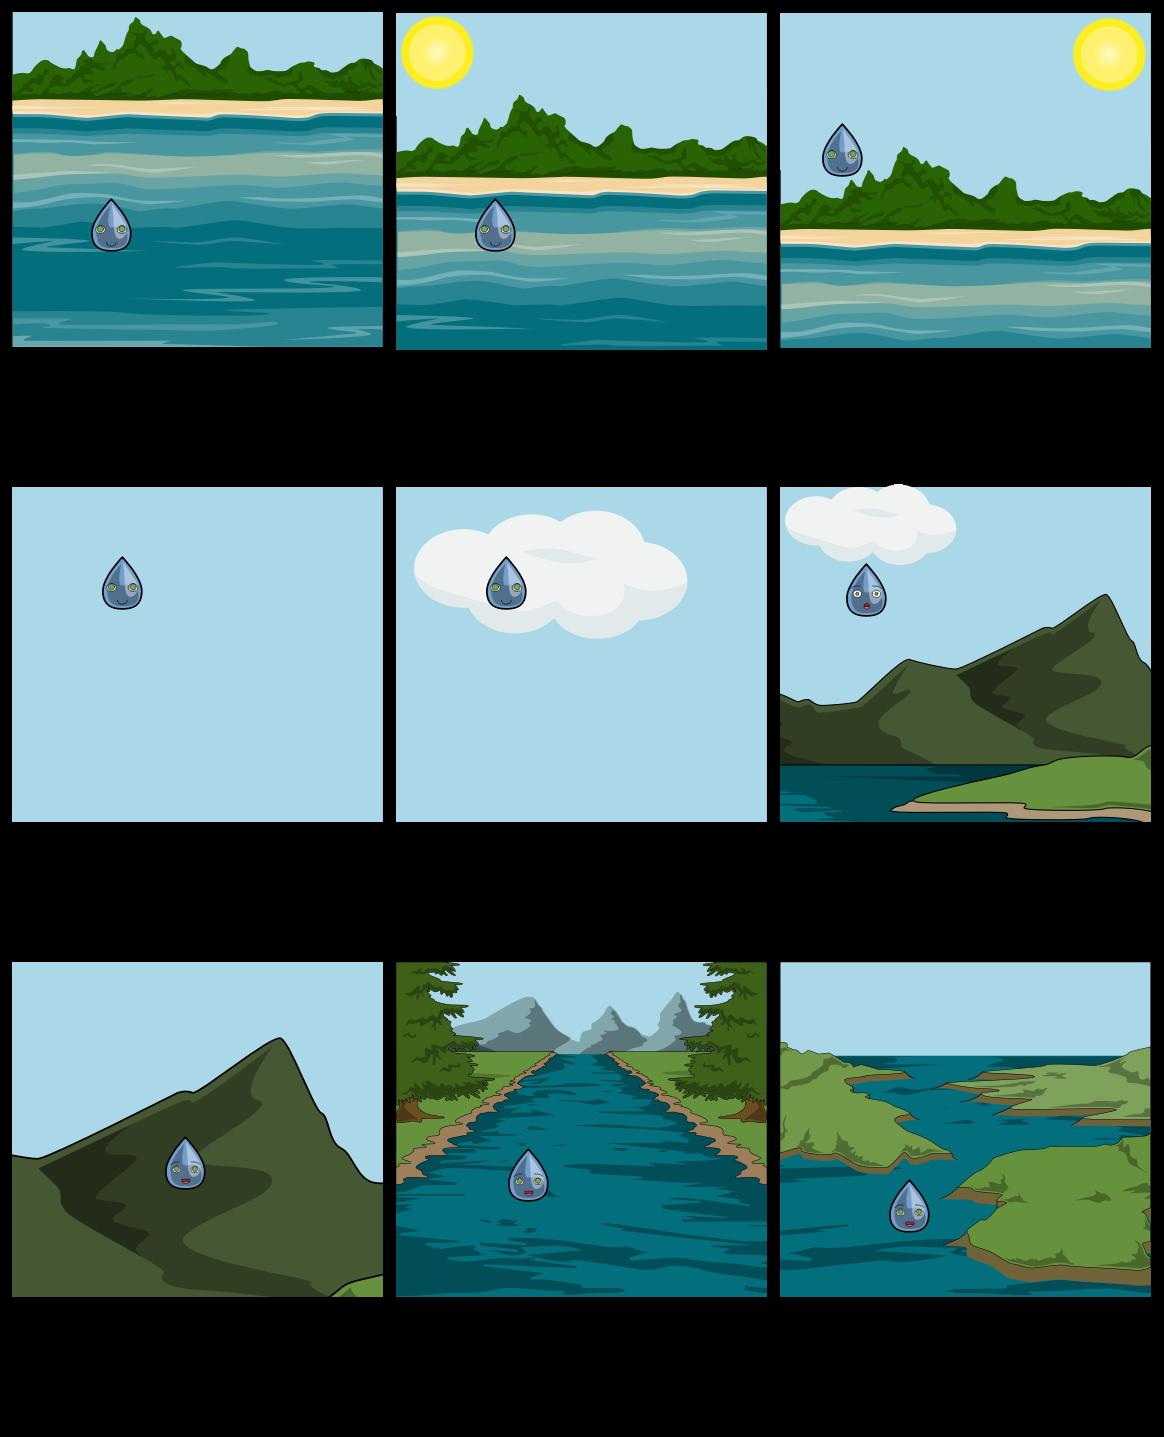 Water Cycle Narrative